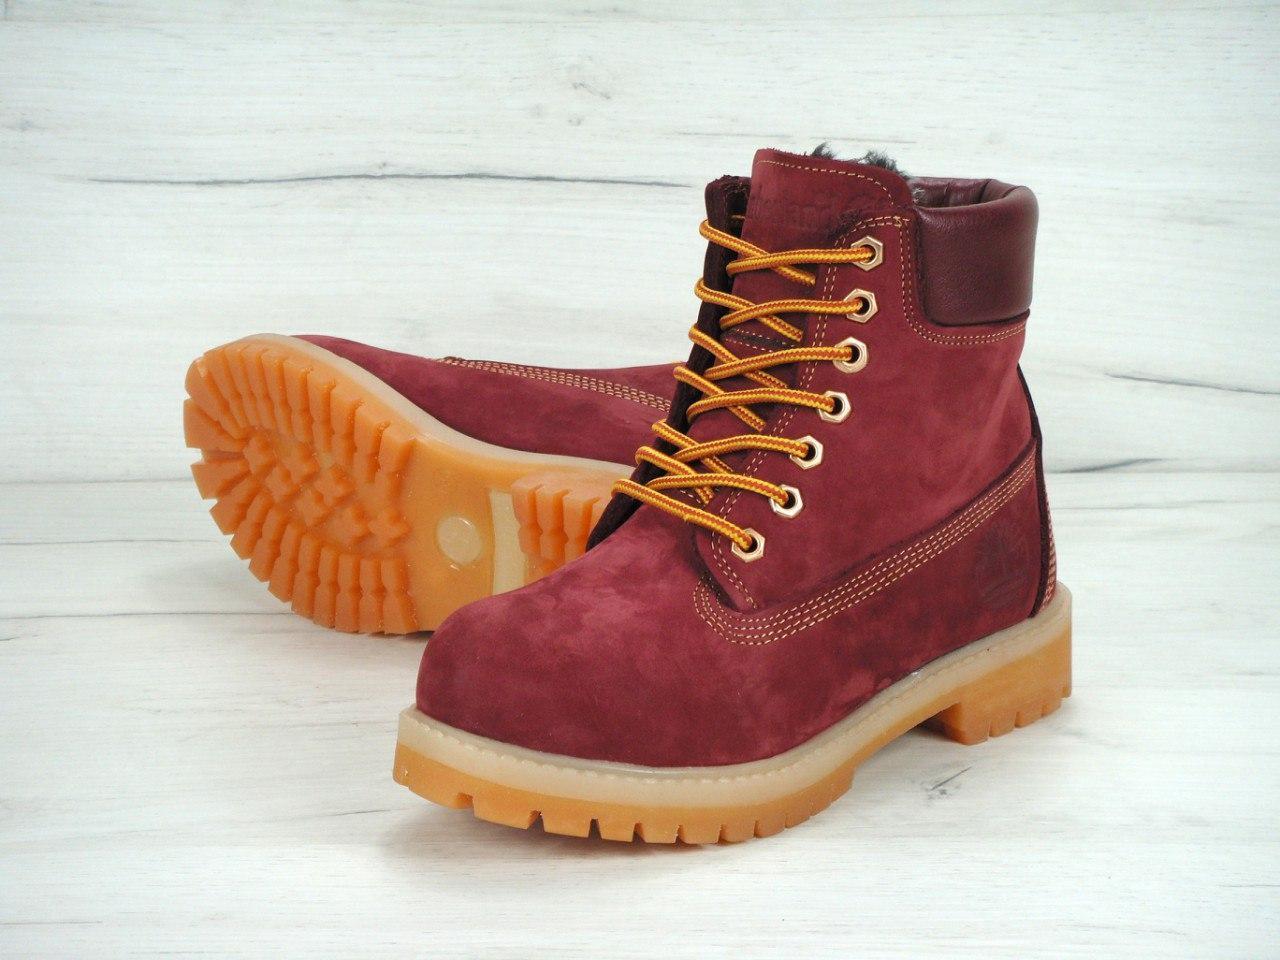 3bc6382a Женские зимние ботинки Timberland bordo с мехом (Реплика ААА+) - Интернет  супермаркет -